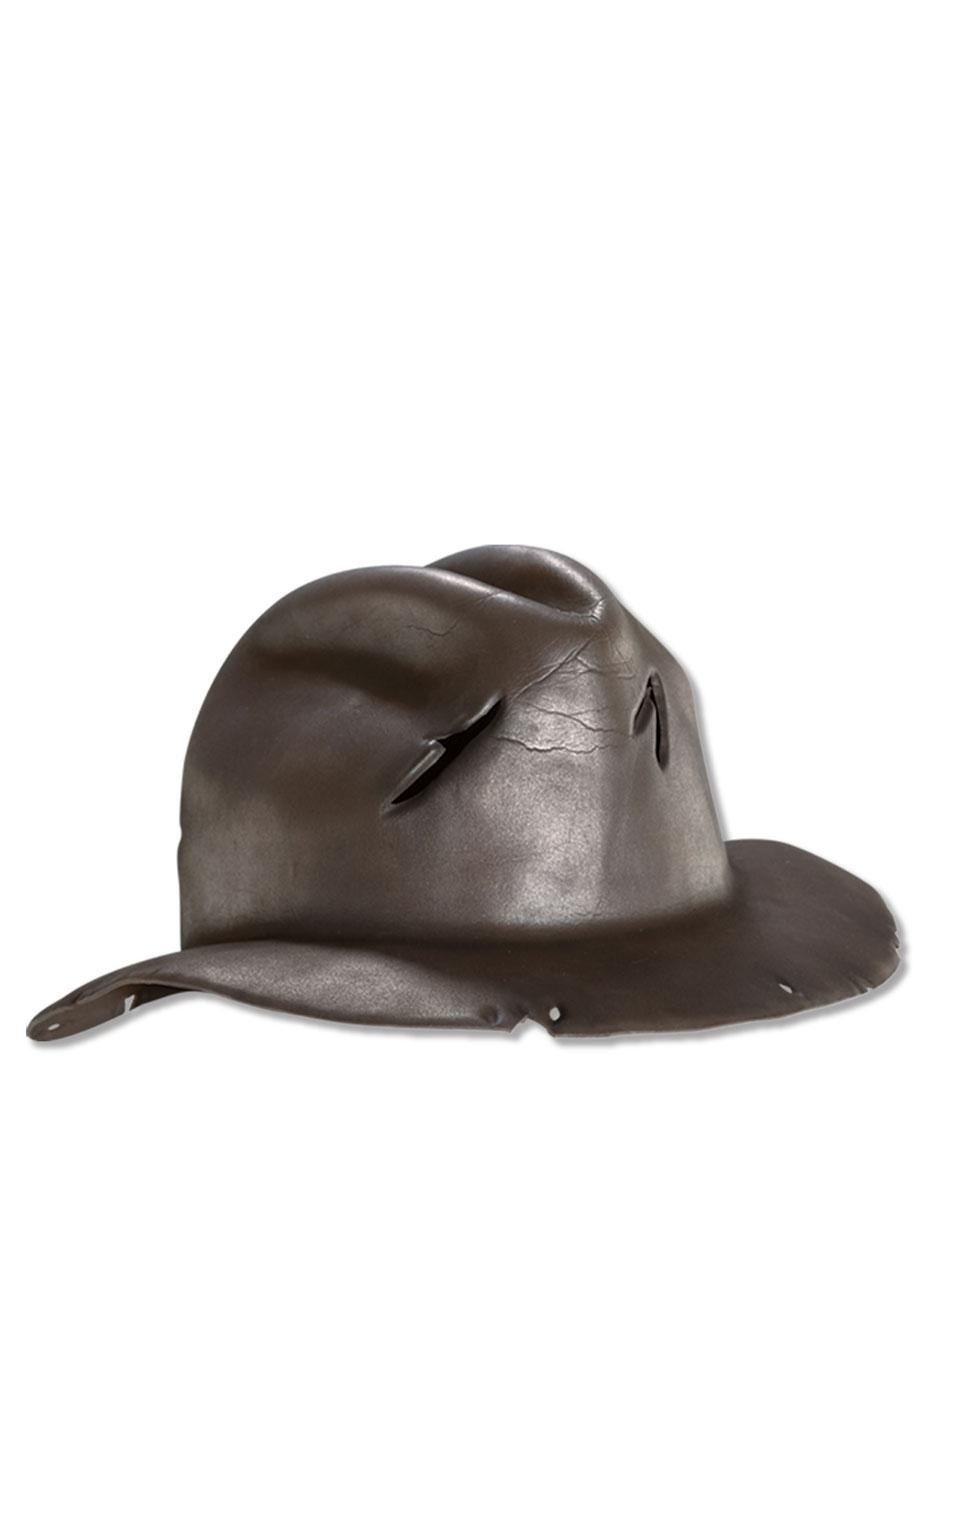 Рваная шляпа Фредди (44) - Киногерои, р.44